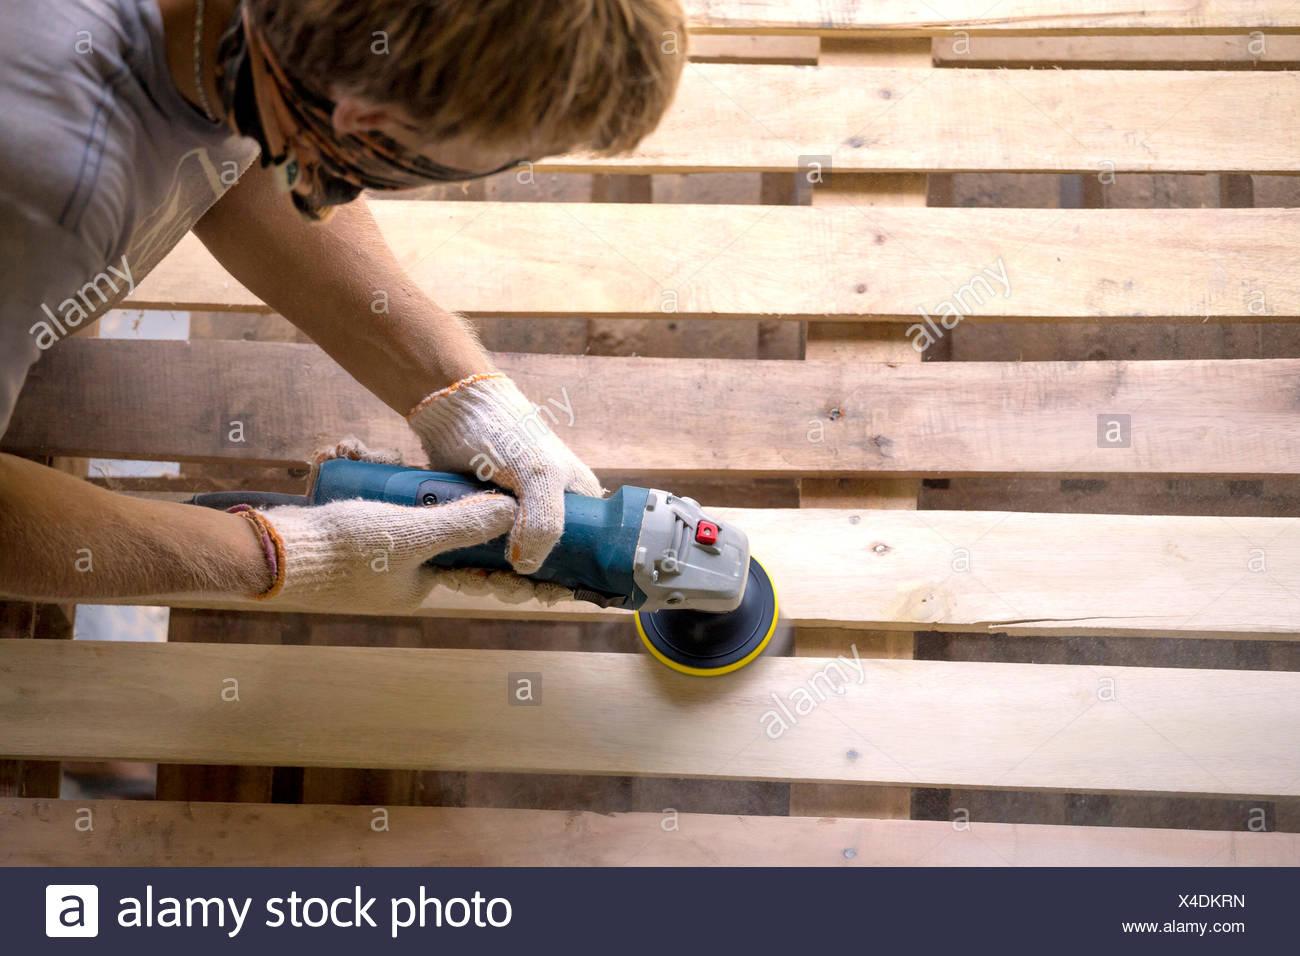 Man sanding pallet with a random orbital sander - Stock Image